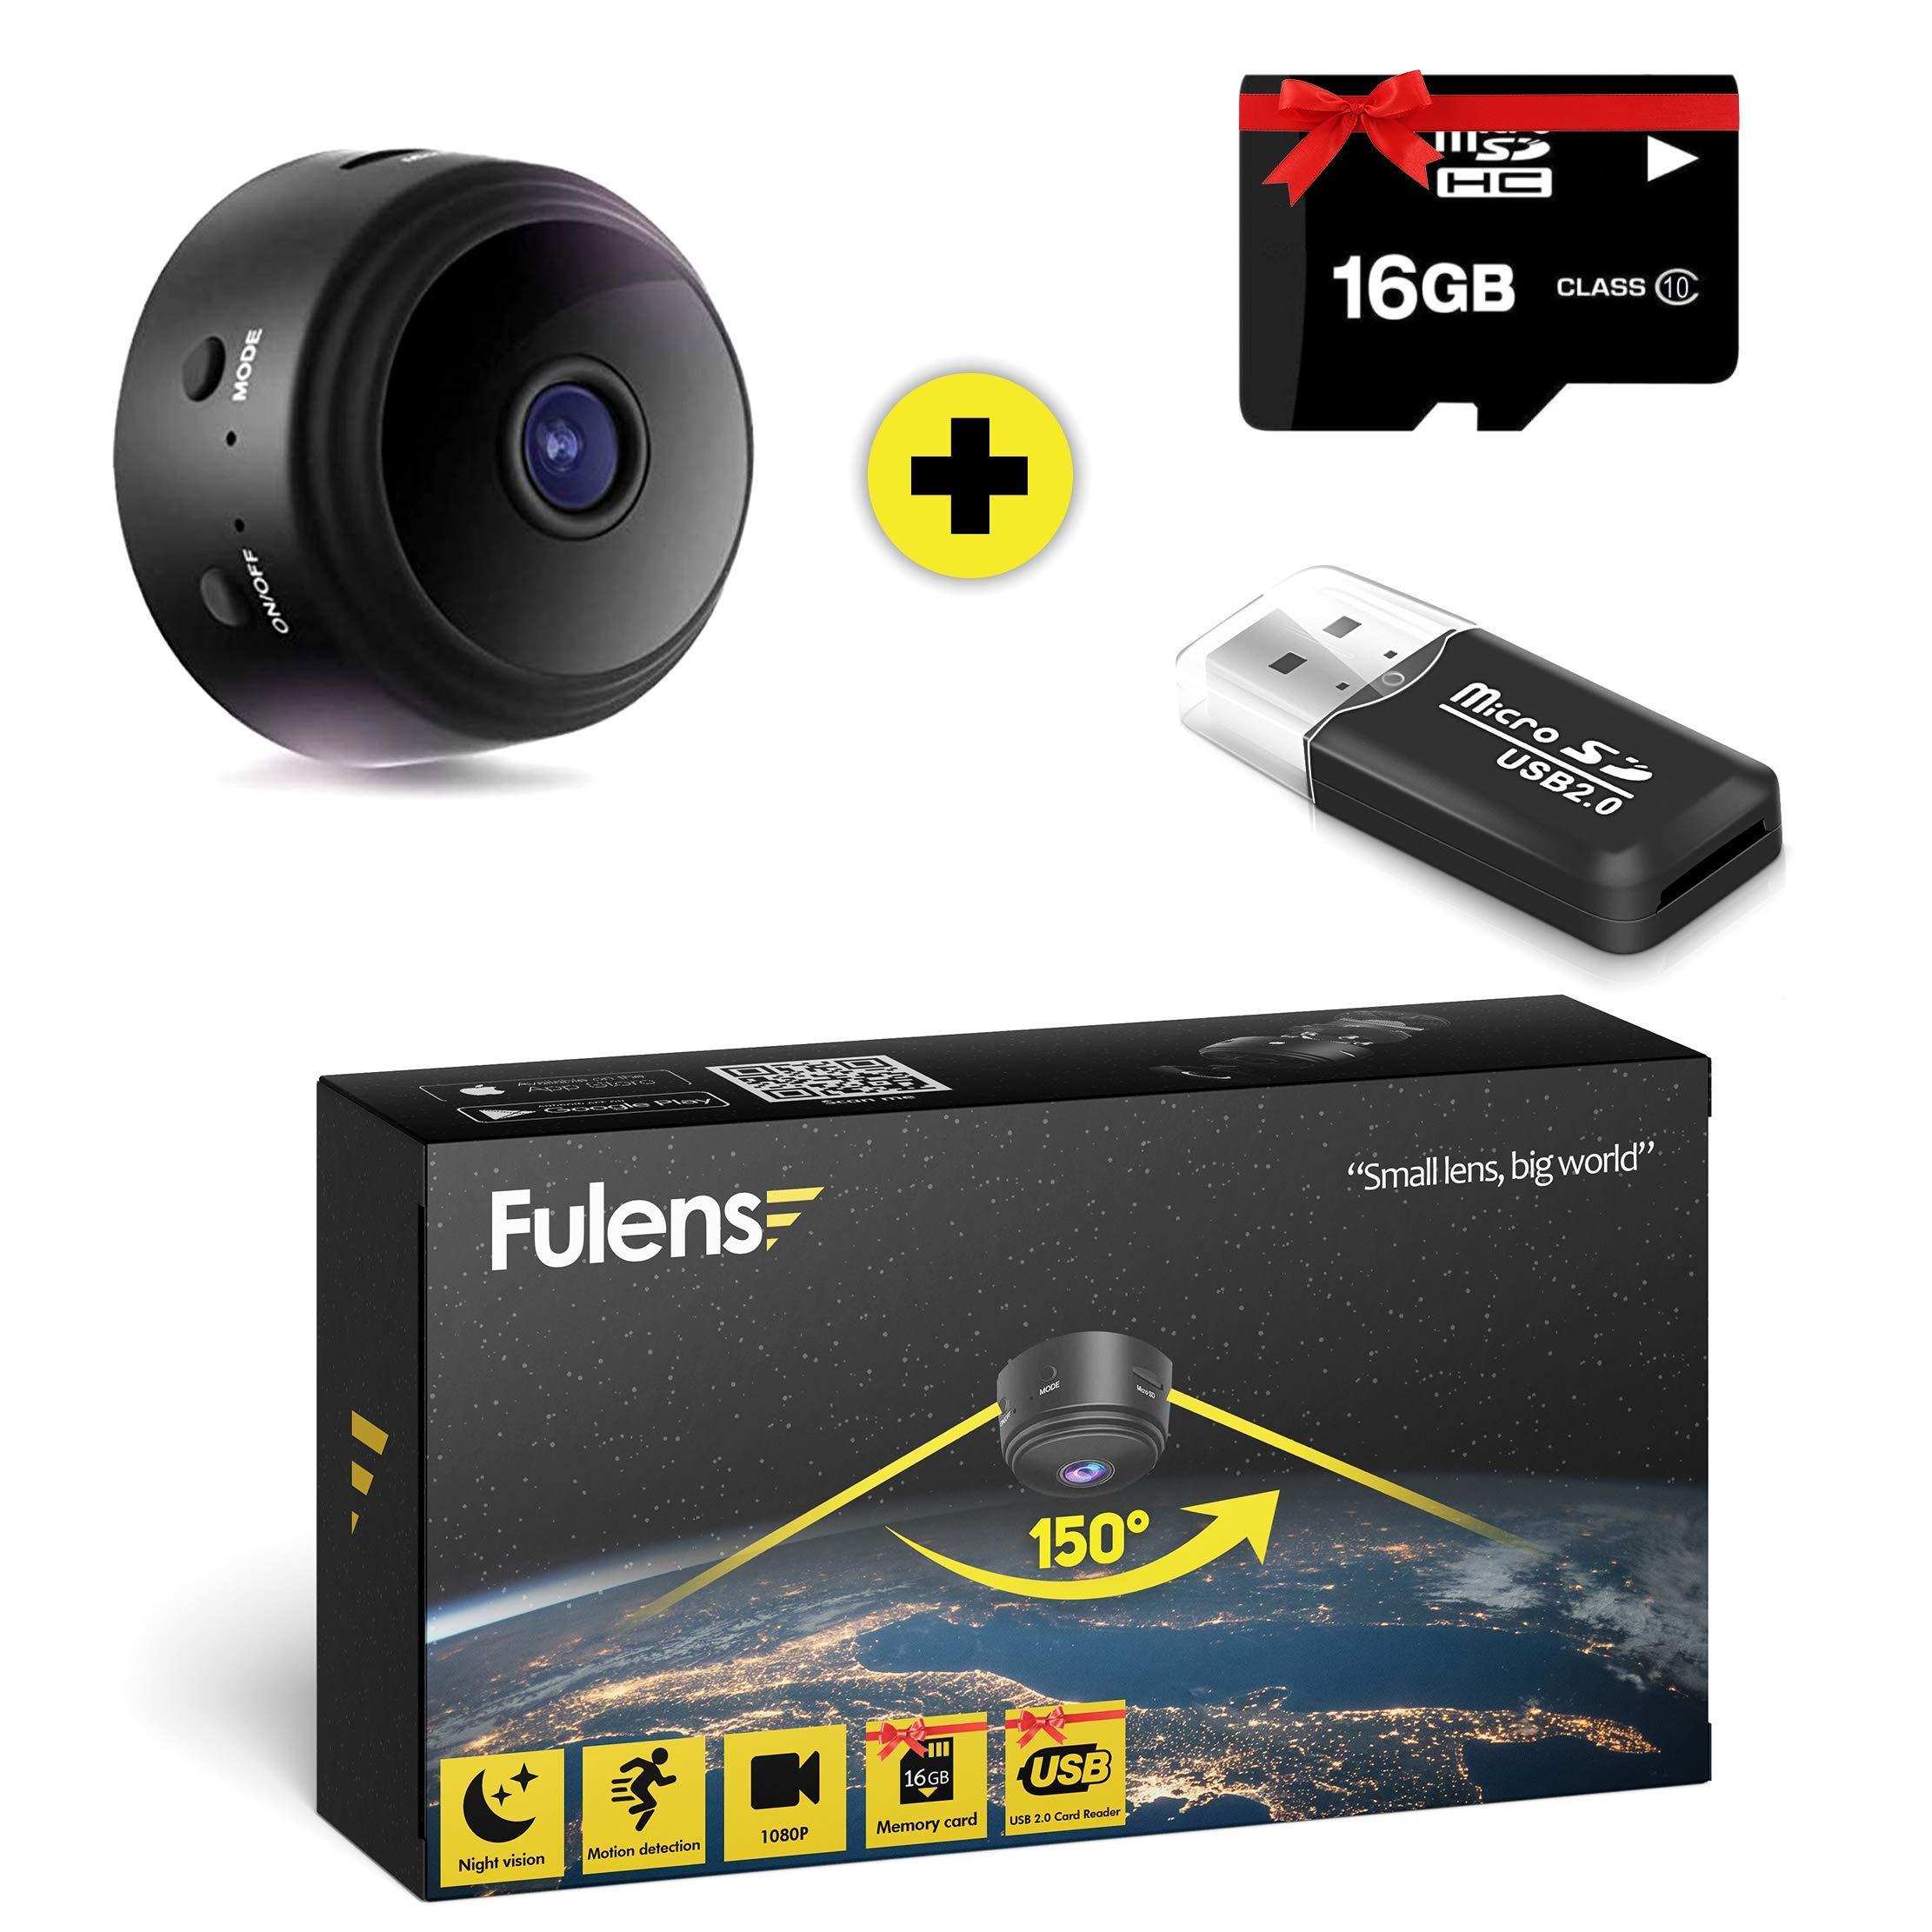 Fulens - Mini spy Hidden Camera, Night Vision WiFi spy Camera, Motion Detection Small Camera